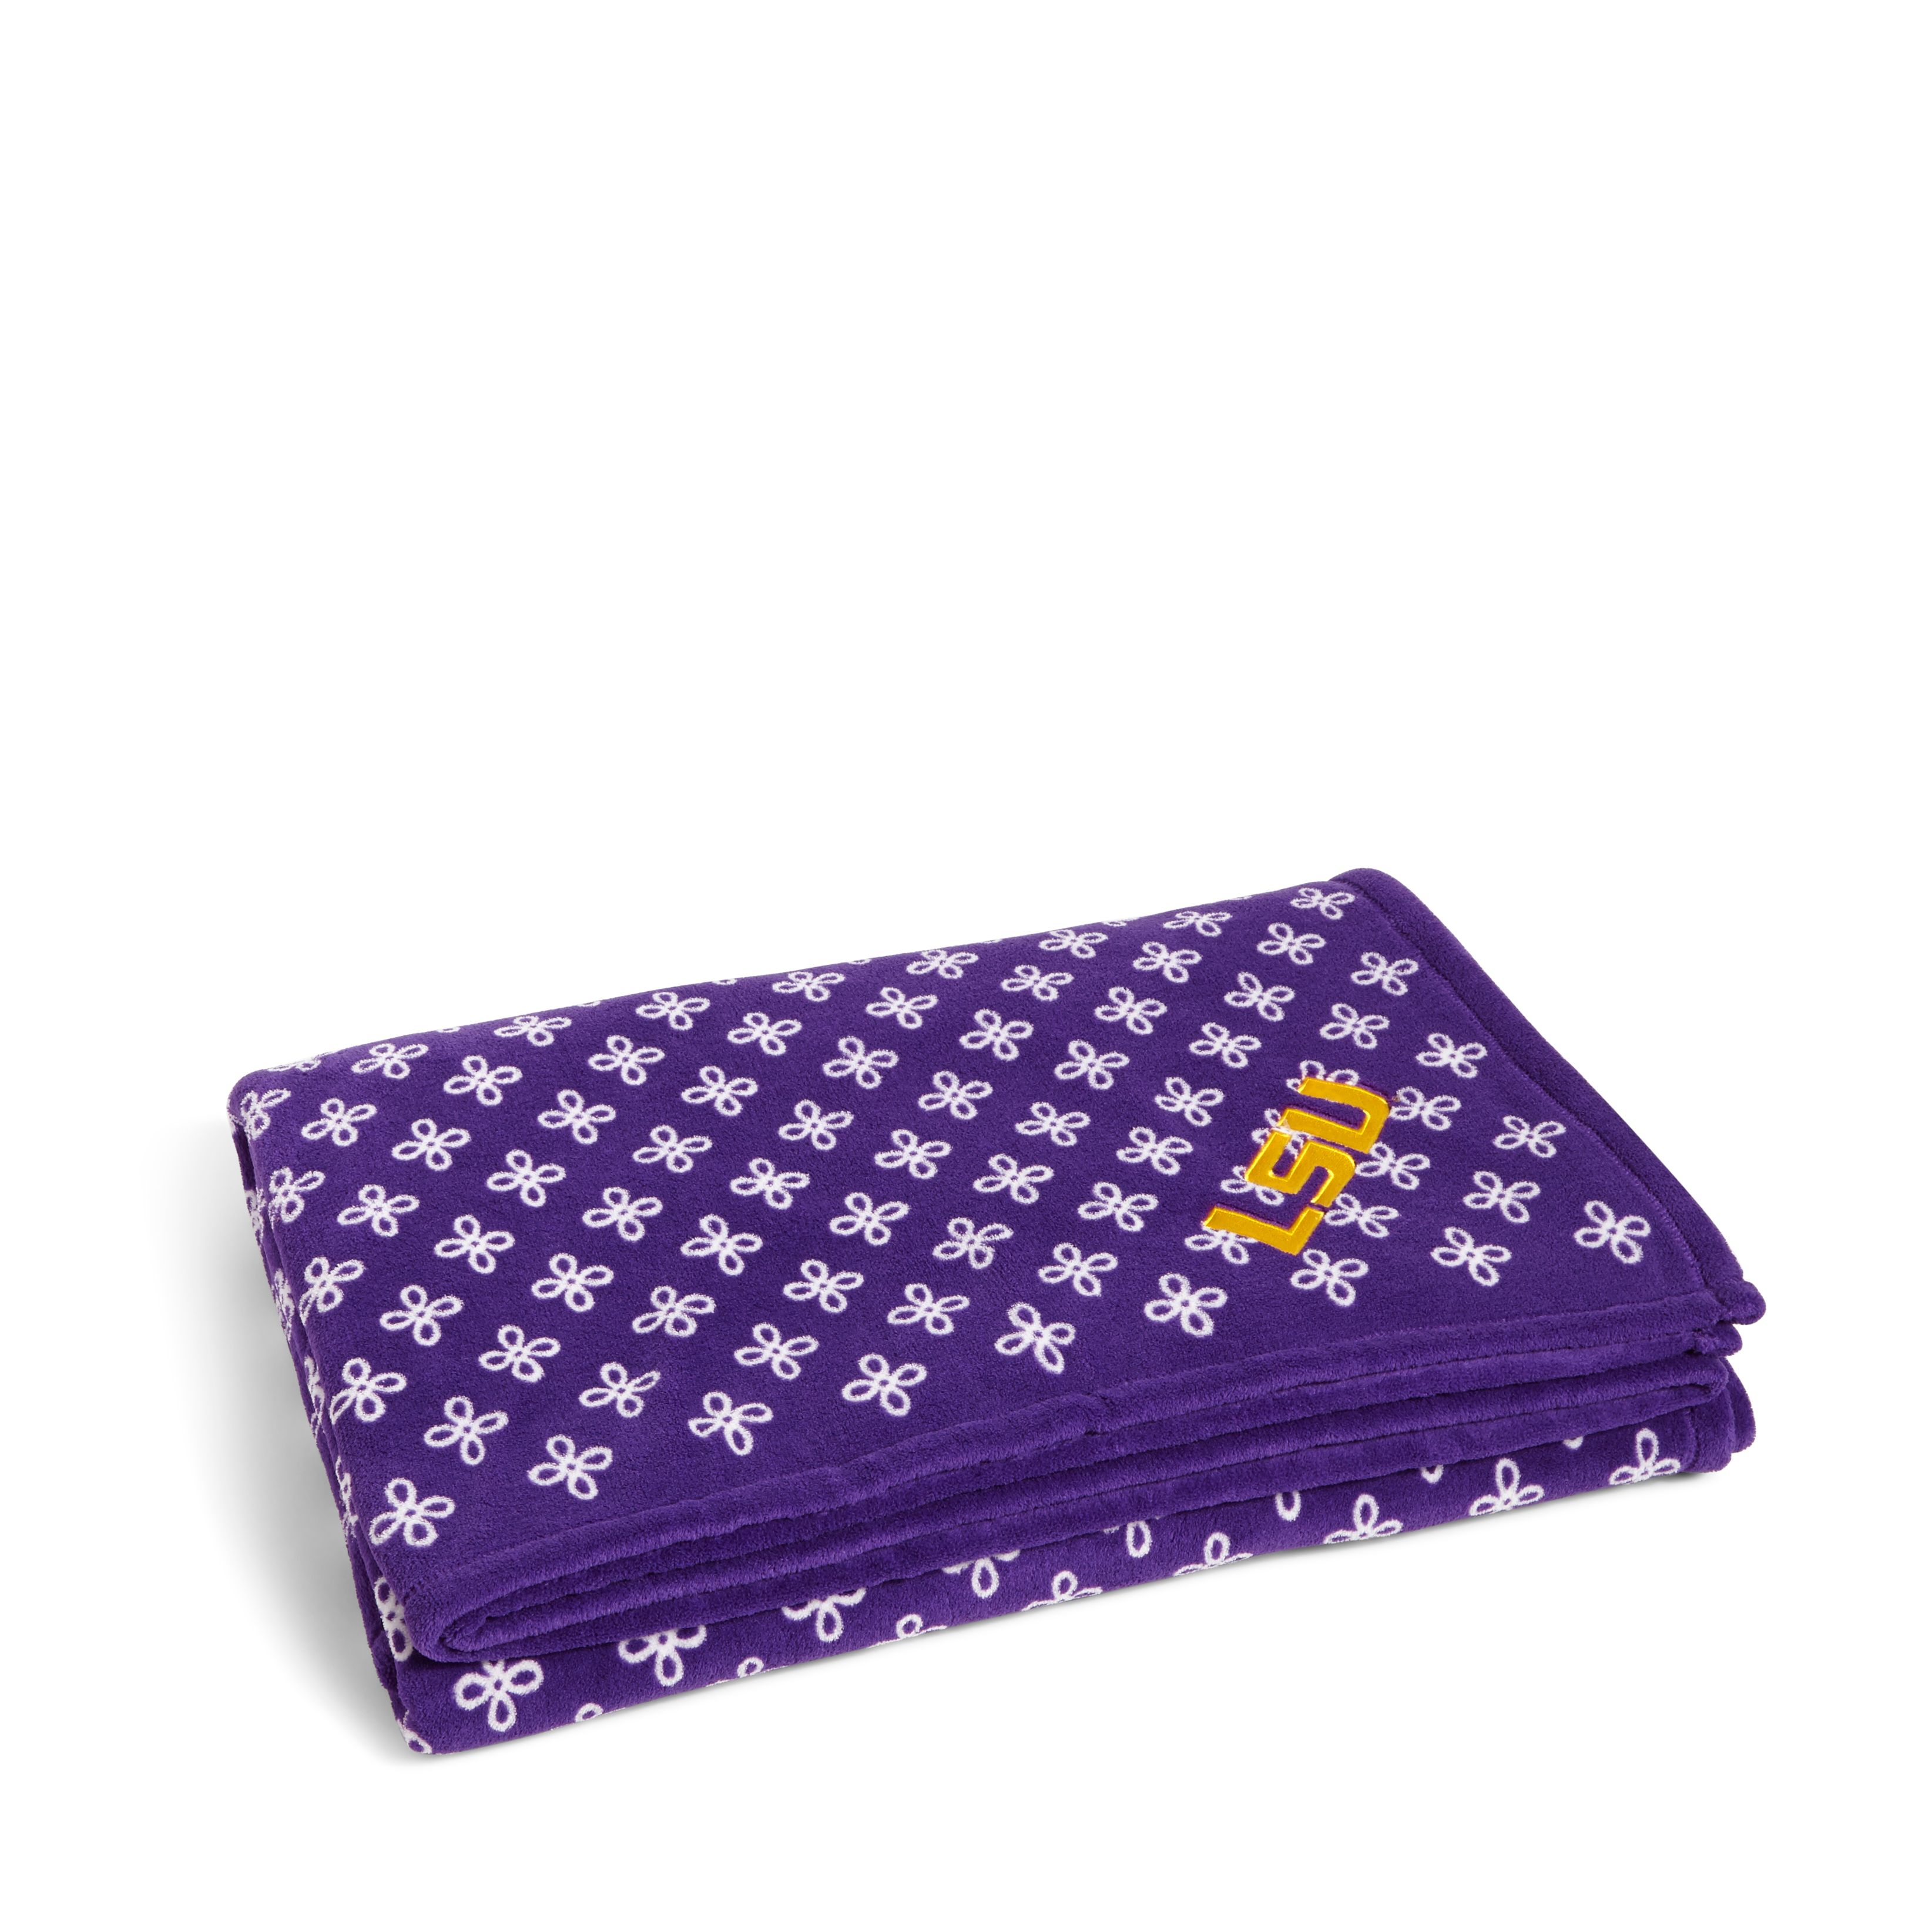 Collegiate Xl Throw Blanket Vera Bradley